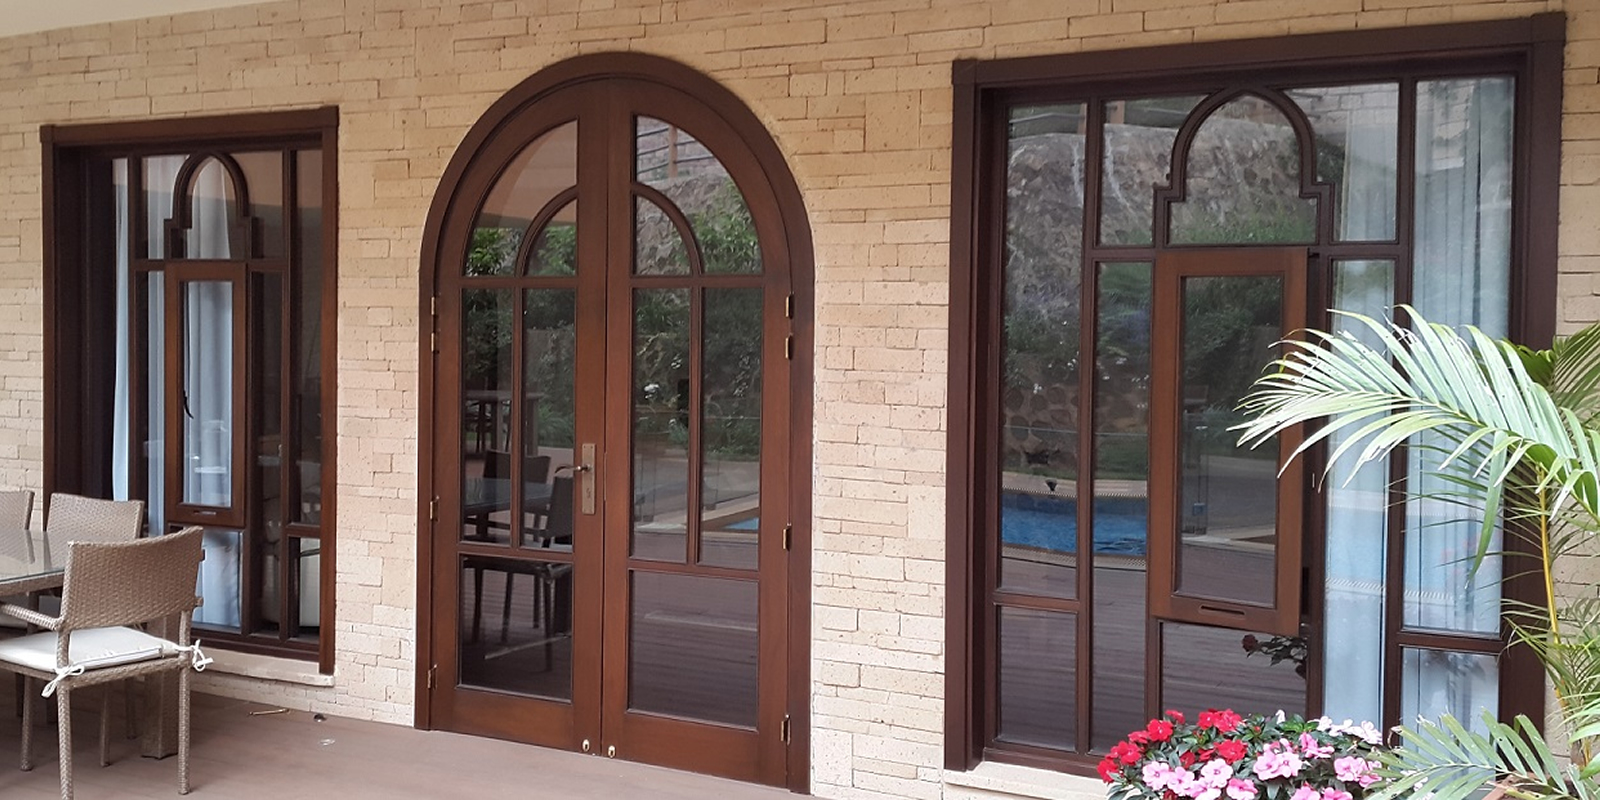 shahtimber-homeslides-1600×800-strong-stylish-wooden-windows-frames-kenua-eastafrica-africa